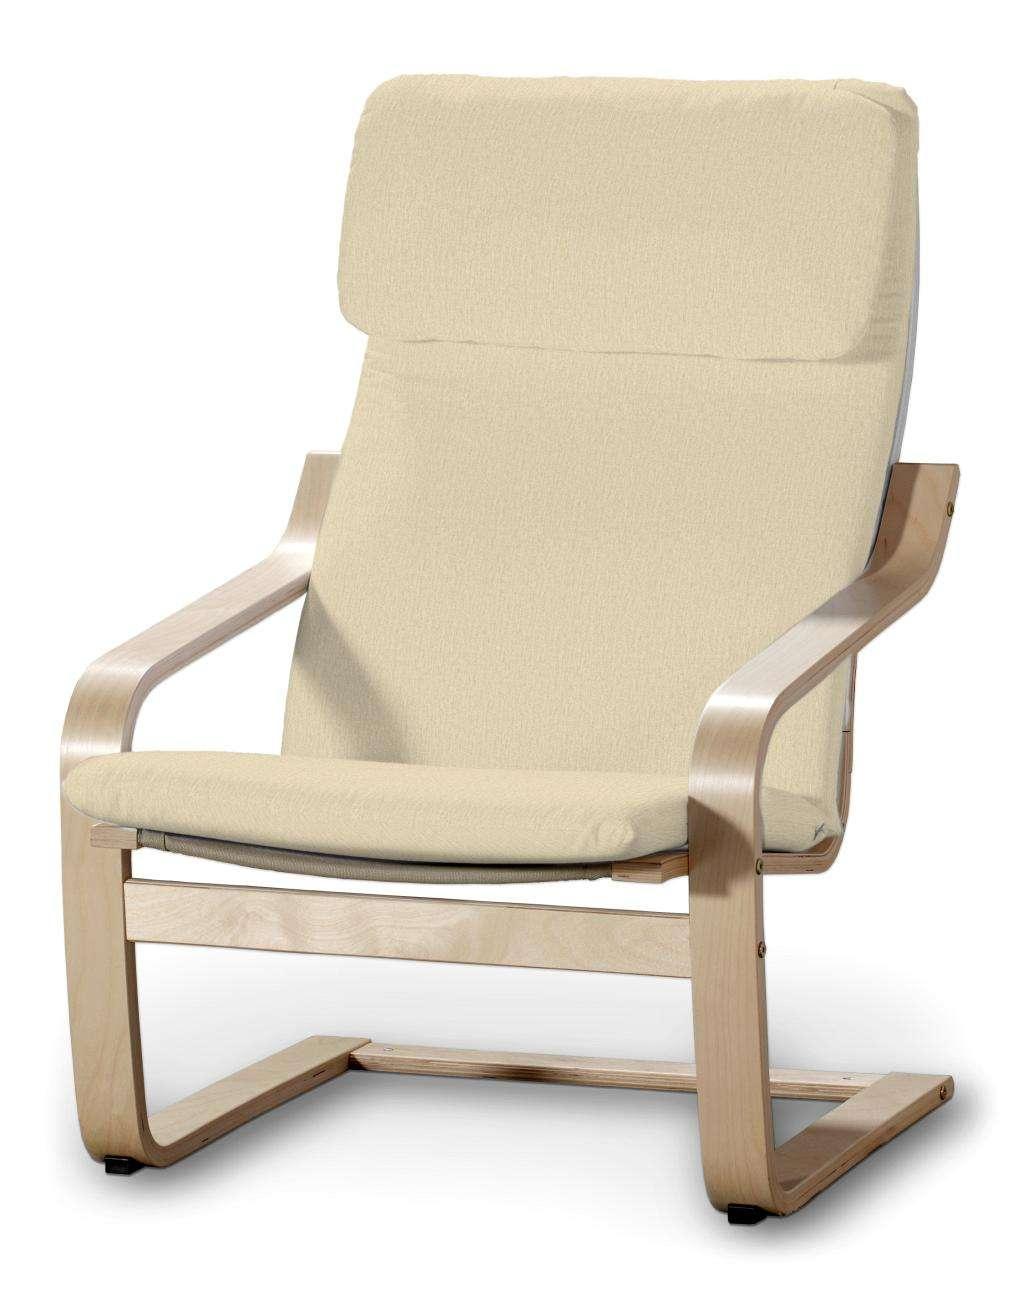 POÄNG  fotelio užvalkalas Poäng armchair kolekcijoje Chenille, audinys: 702-22